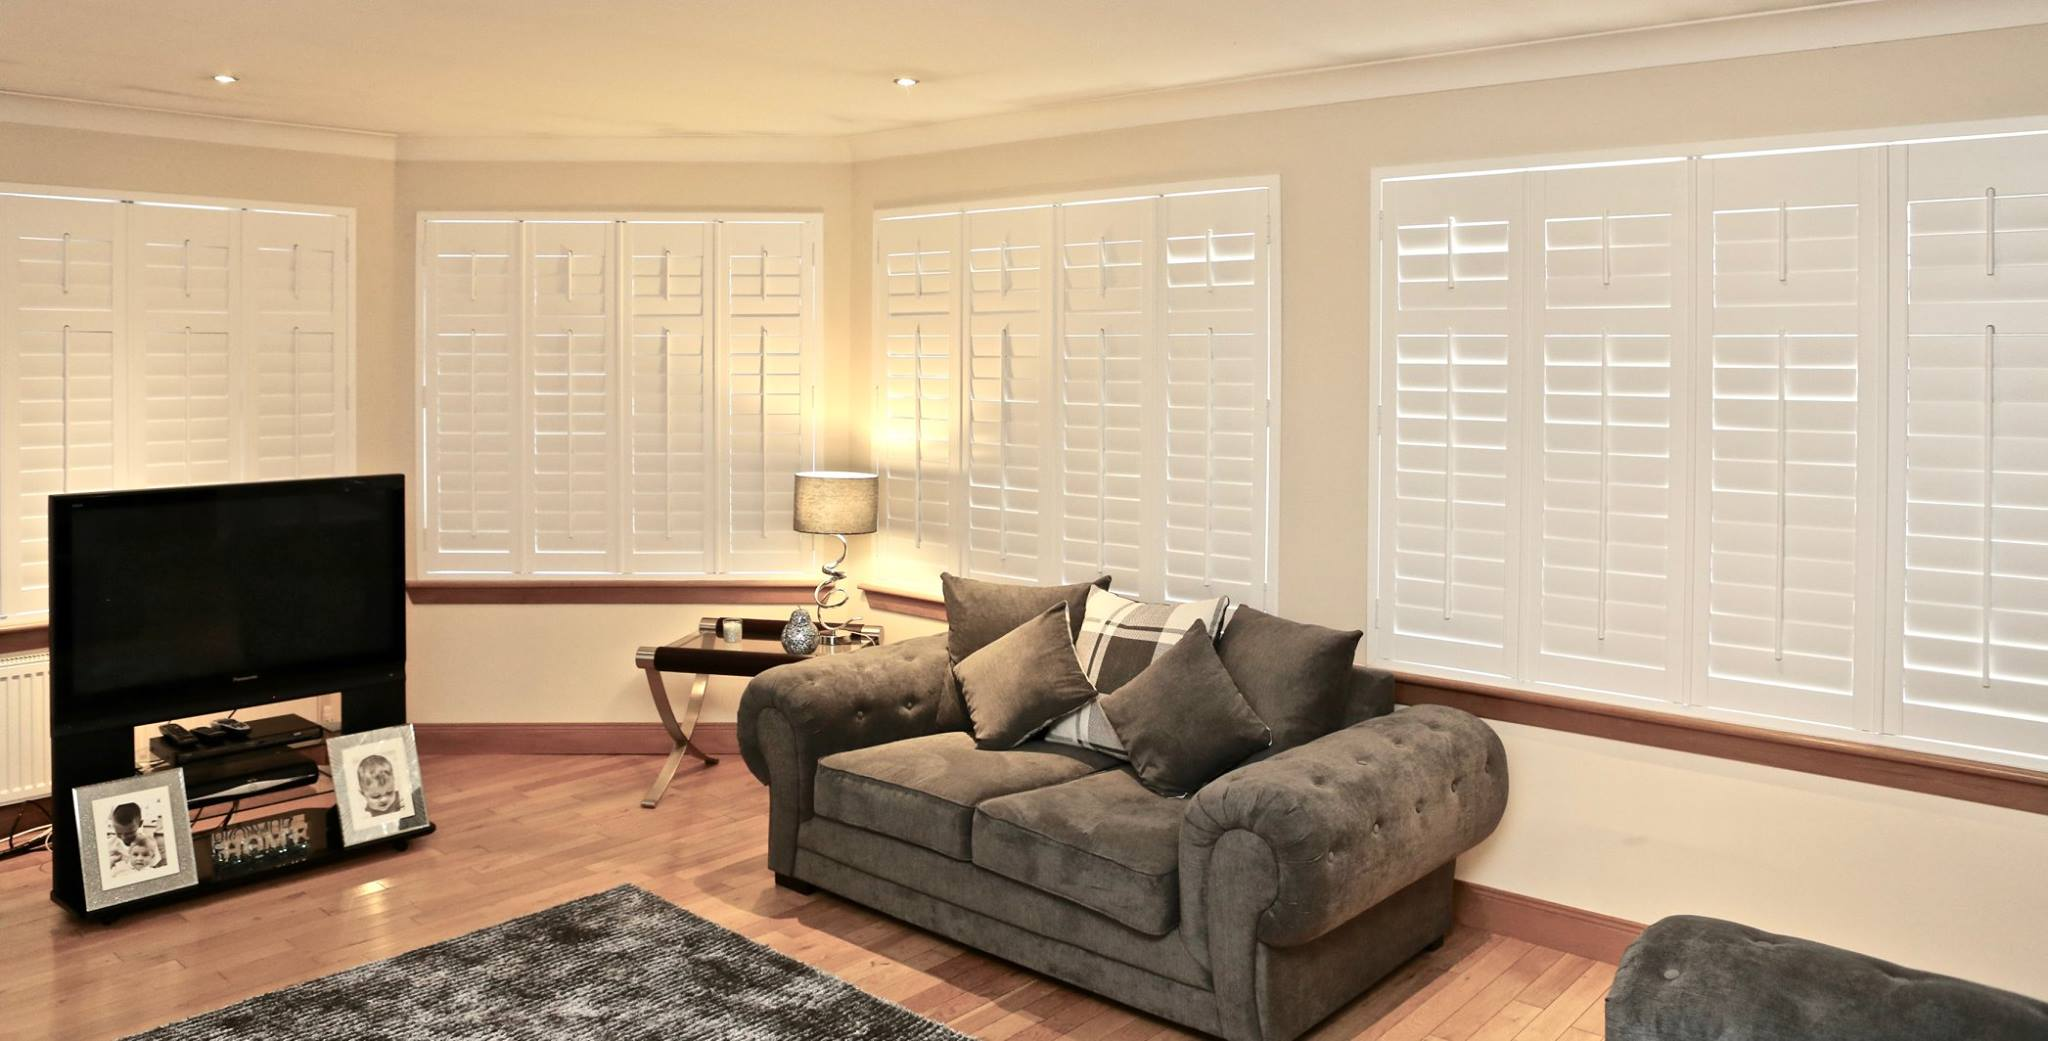 window-shutters-white.jpg